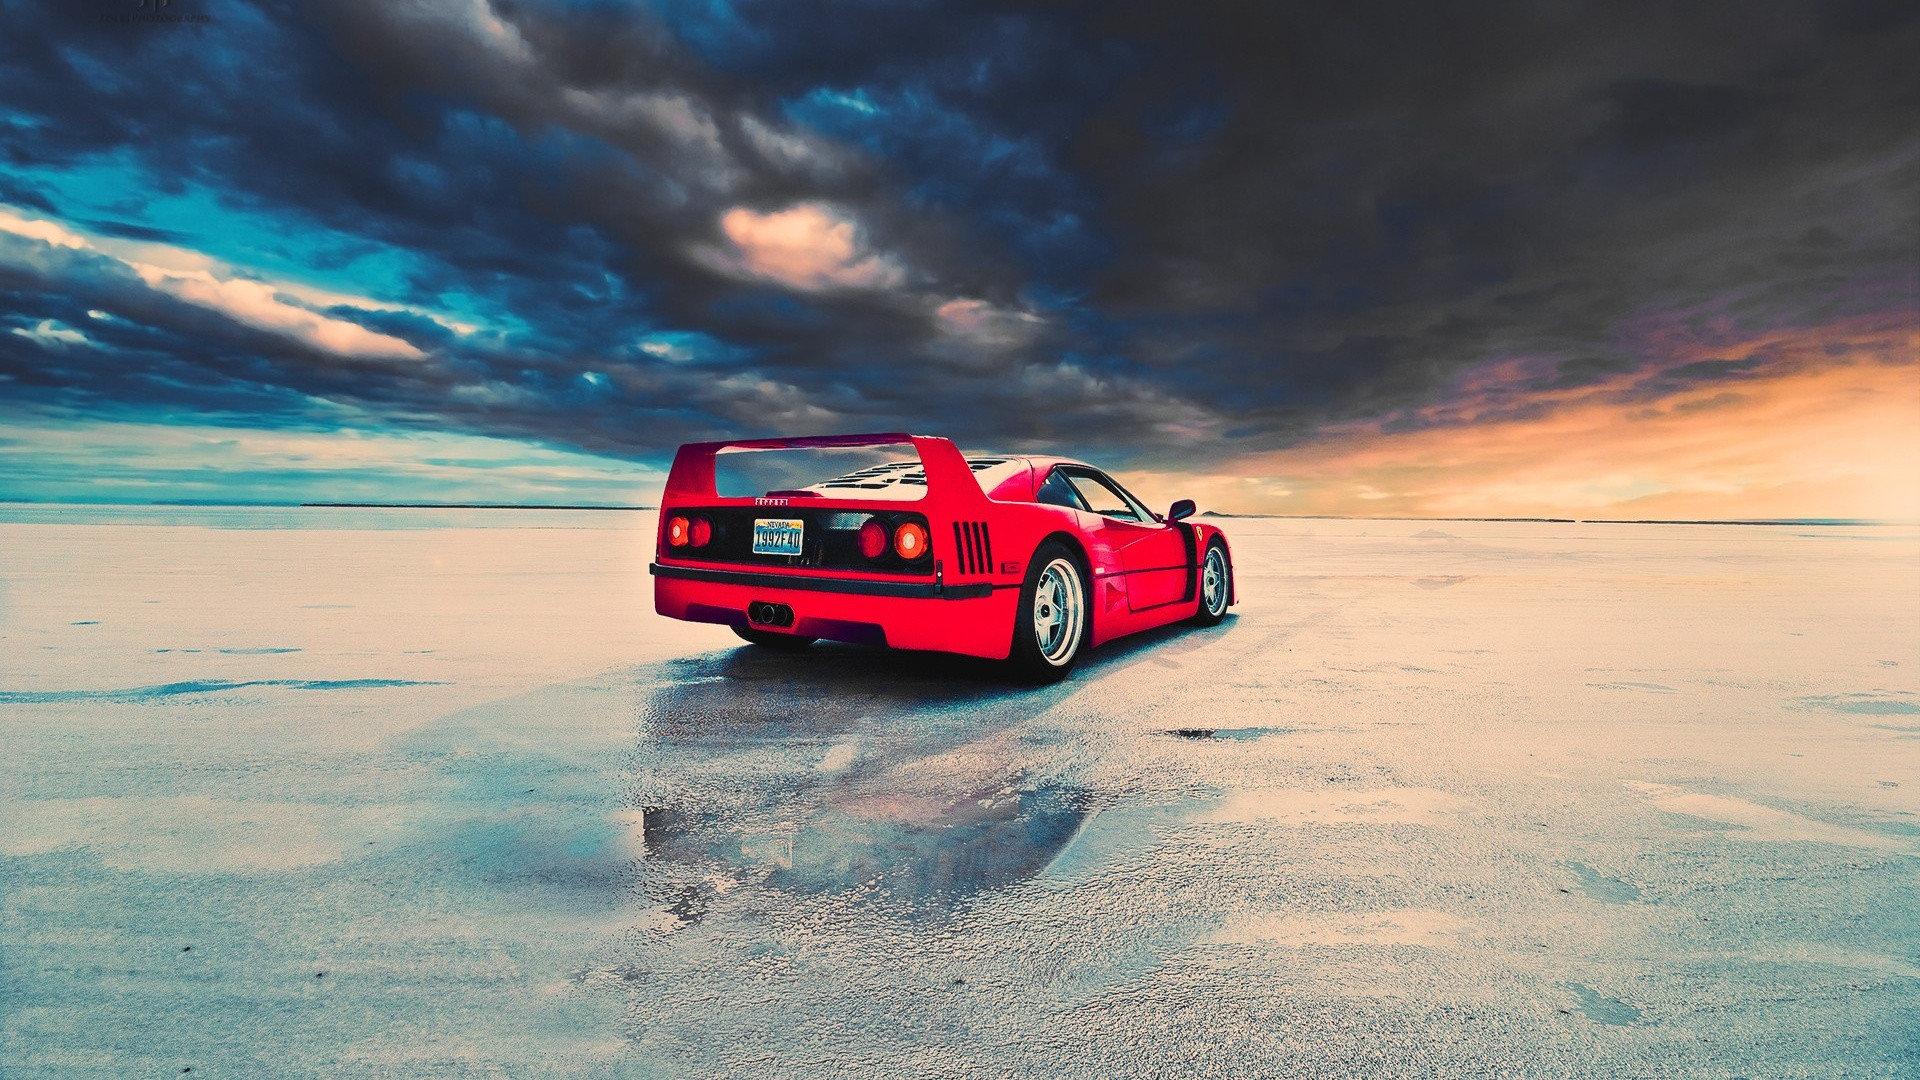 Free Download Ferrari Wallpaper Id 368033 1080p For Pc